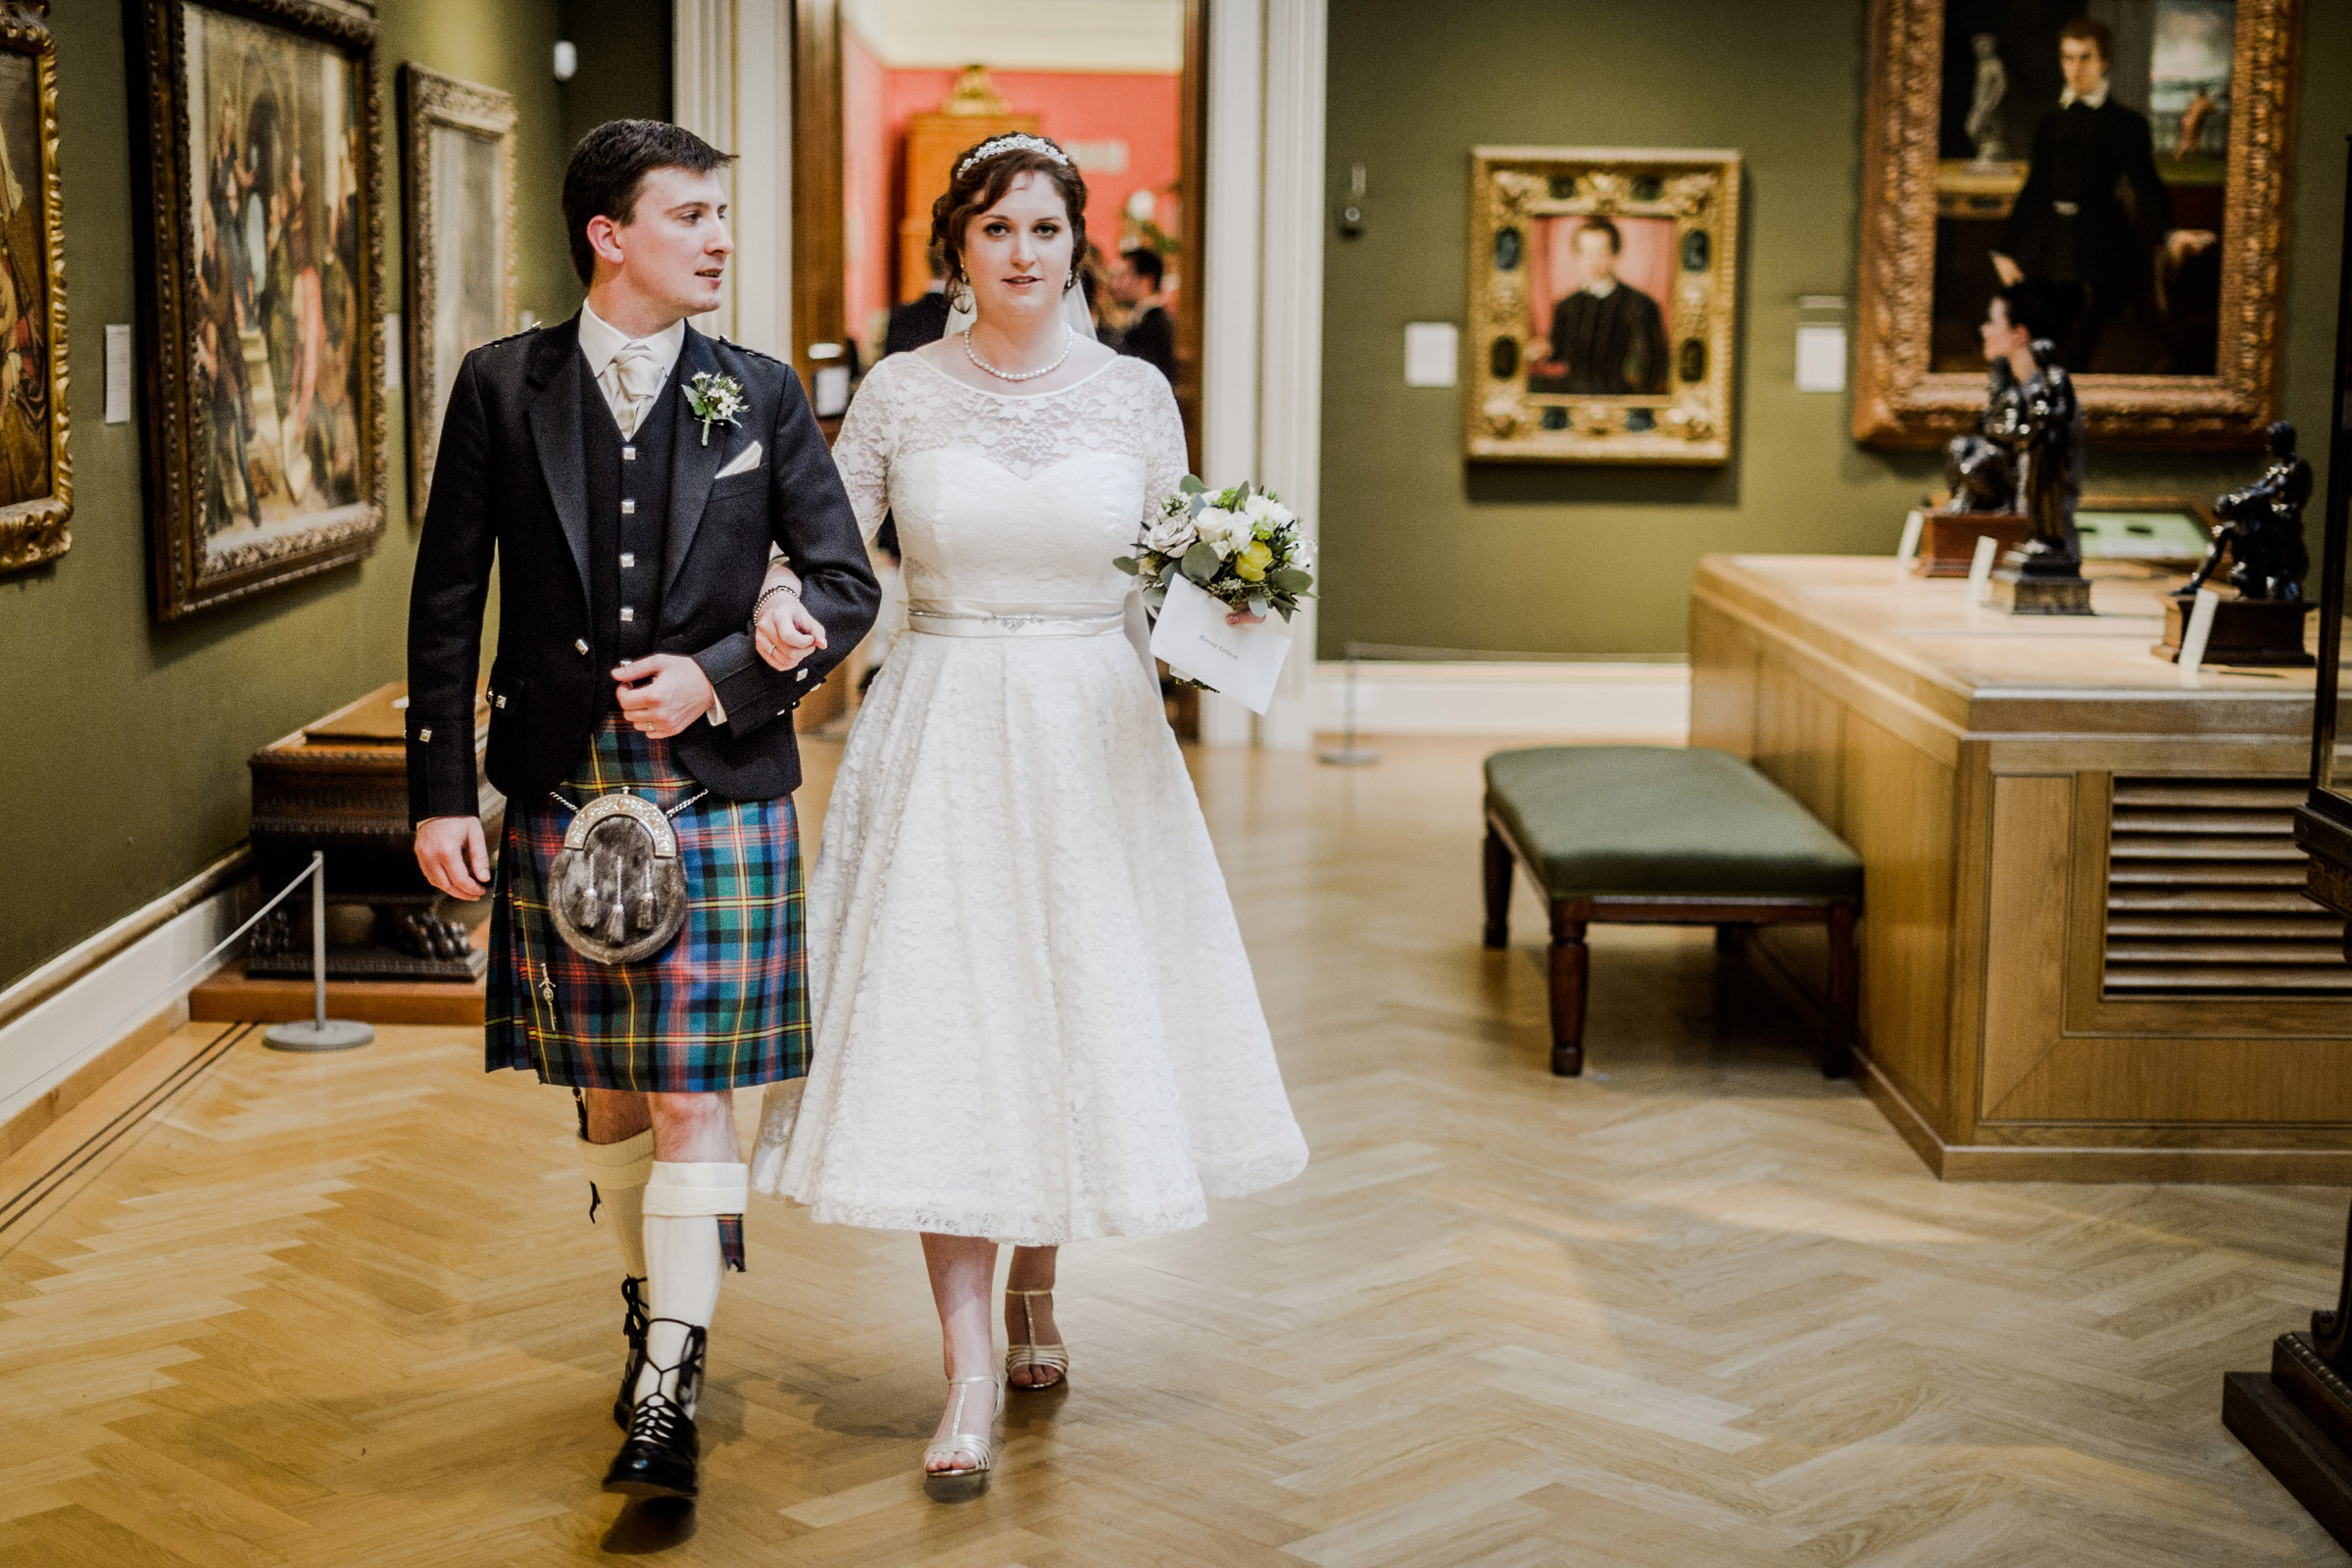 Ashmolean-Museum-Wedding-Pictures-0031.jpg